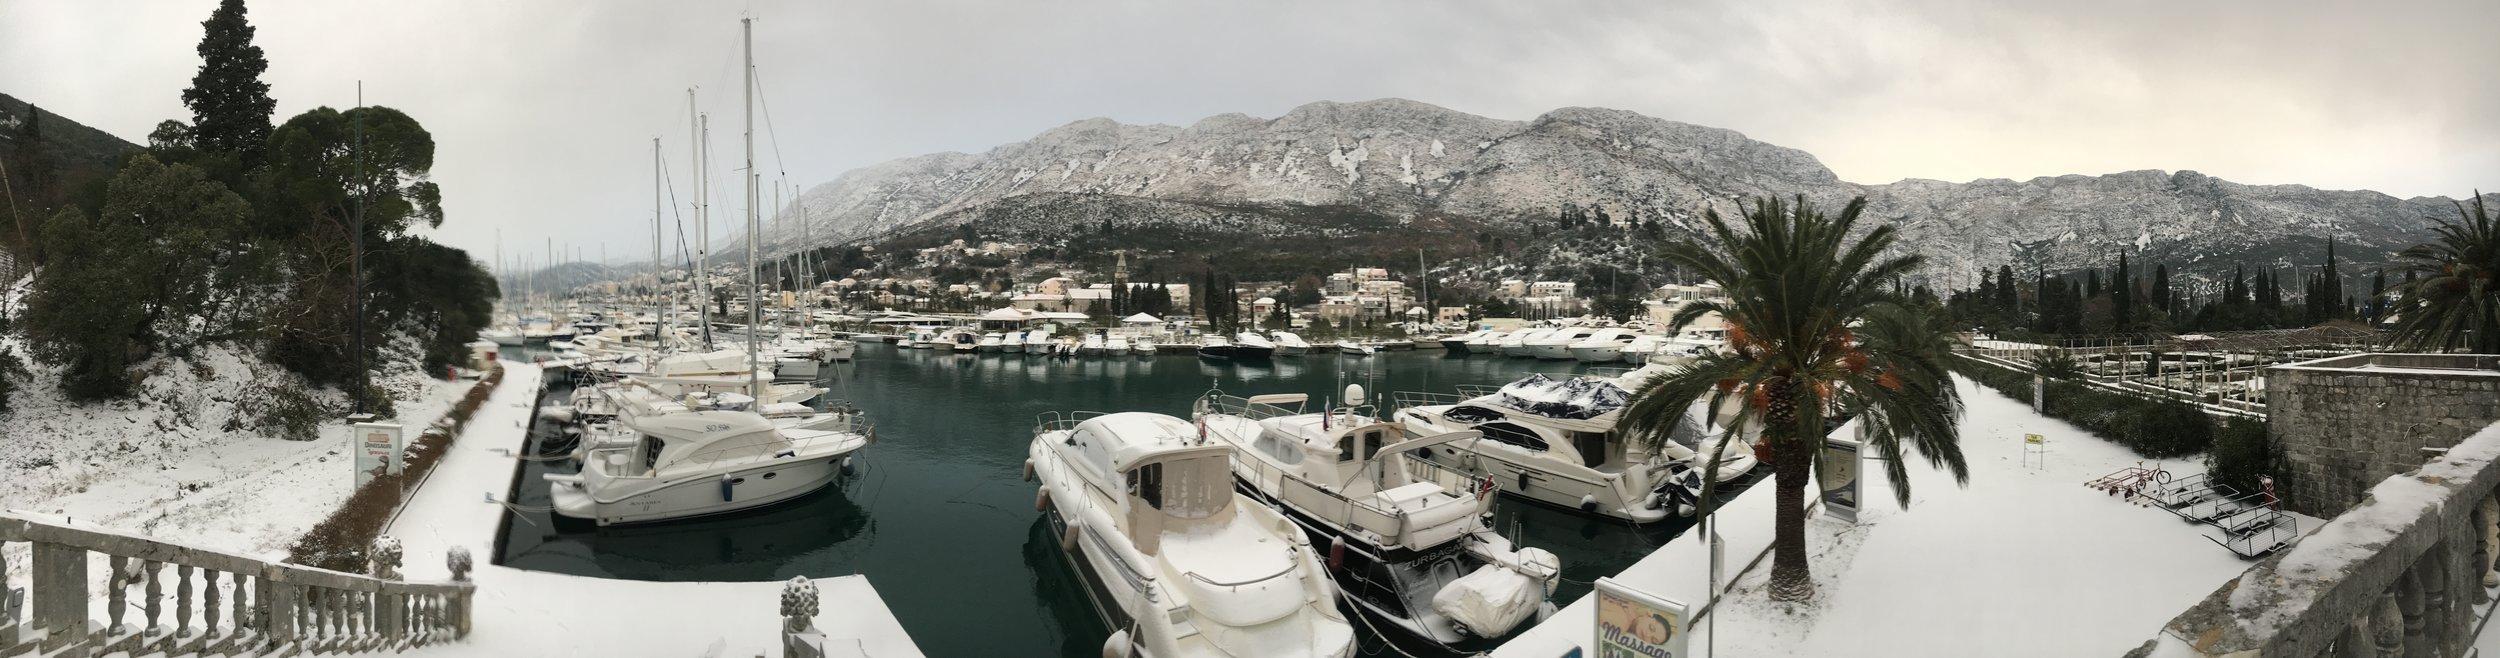 Panorama of the Marina Dubrovnik.